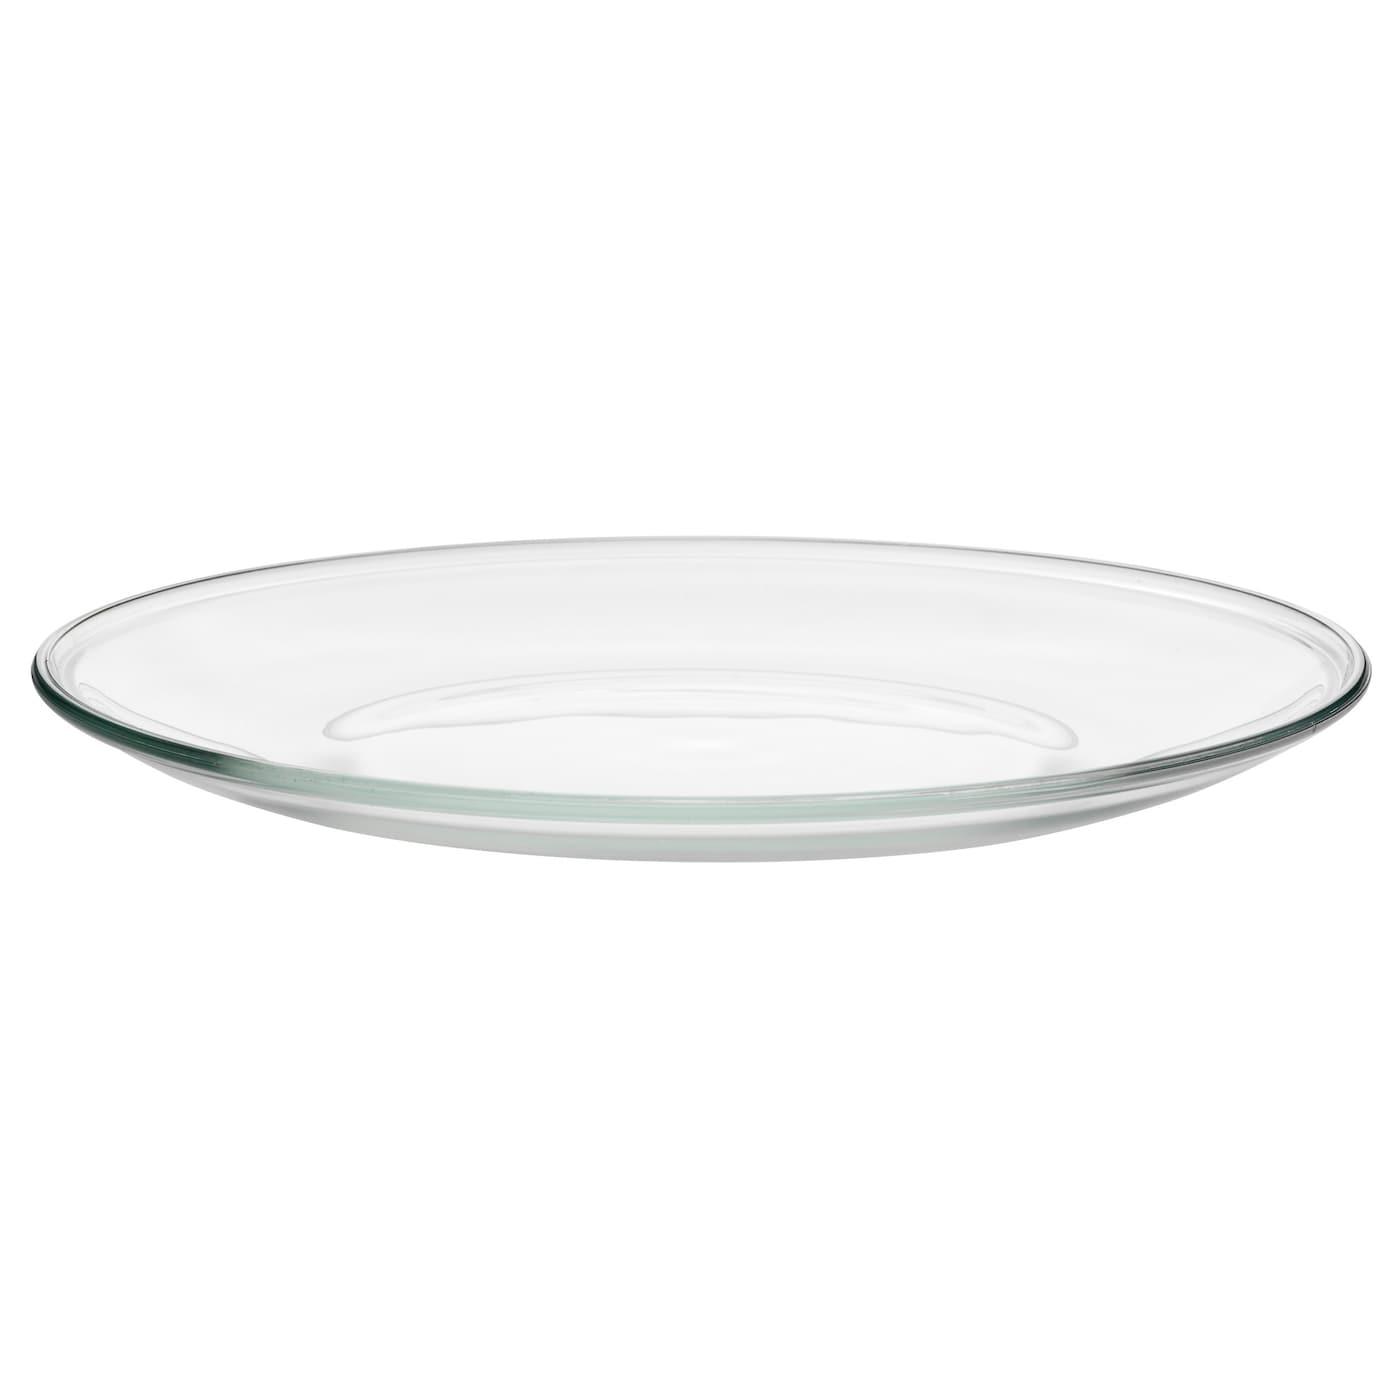 214 Ppen Plate Clear Glass 23 Cm Ikea